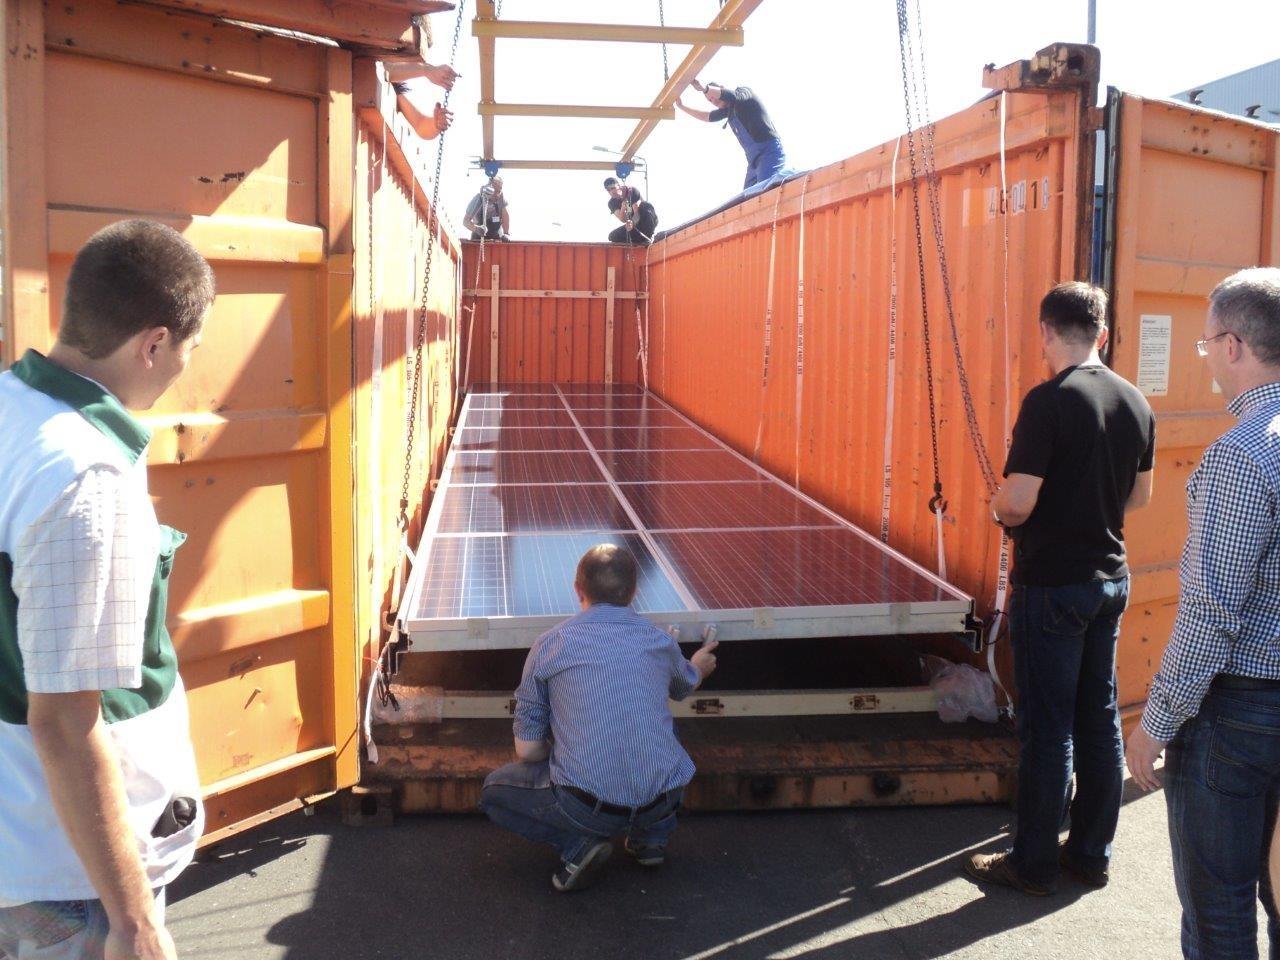 Arriendo de Paneles Solares asequibles. Image © ONU